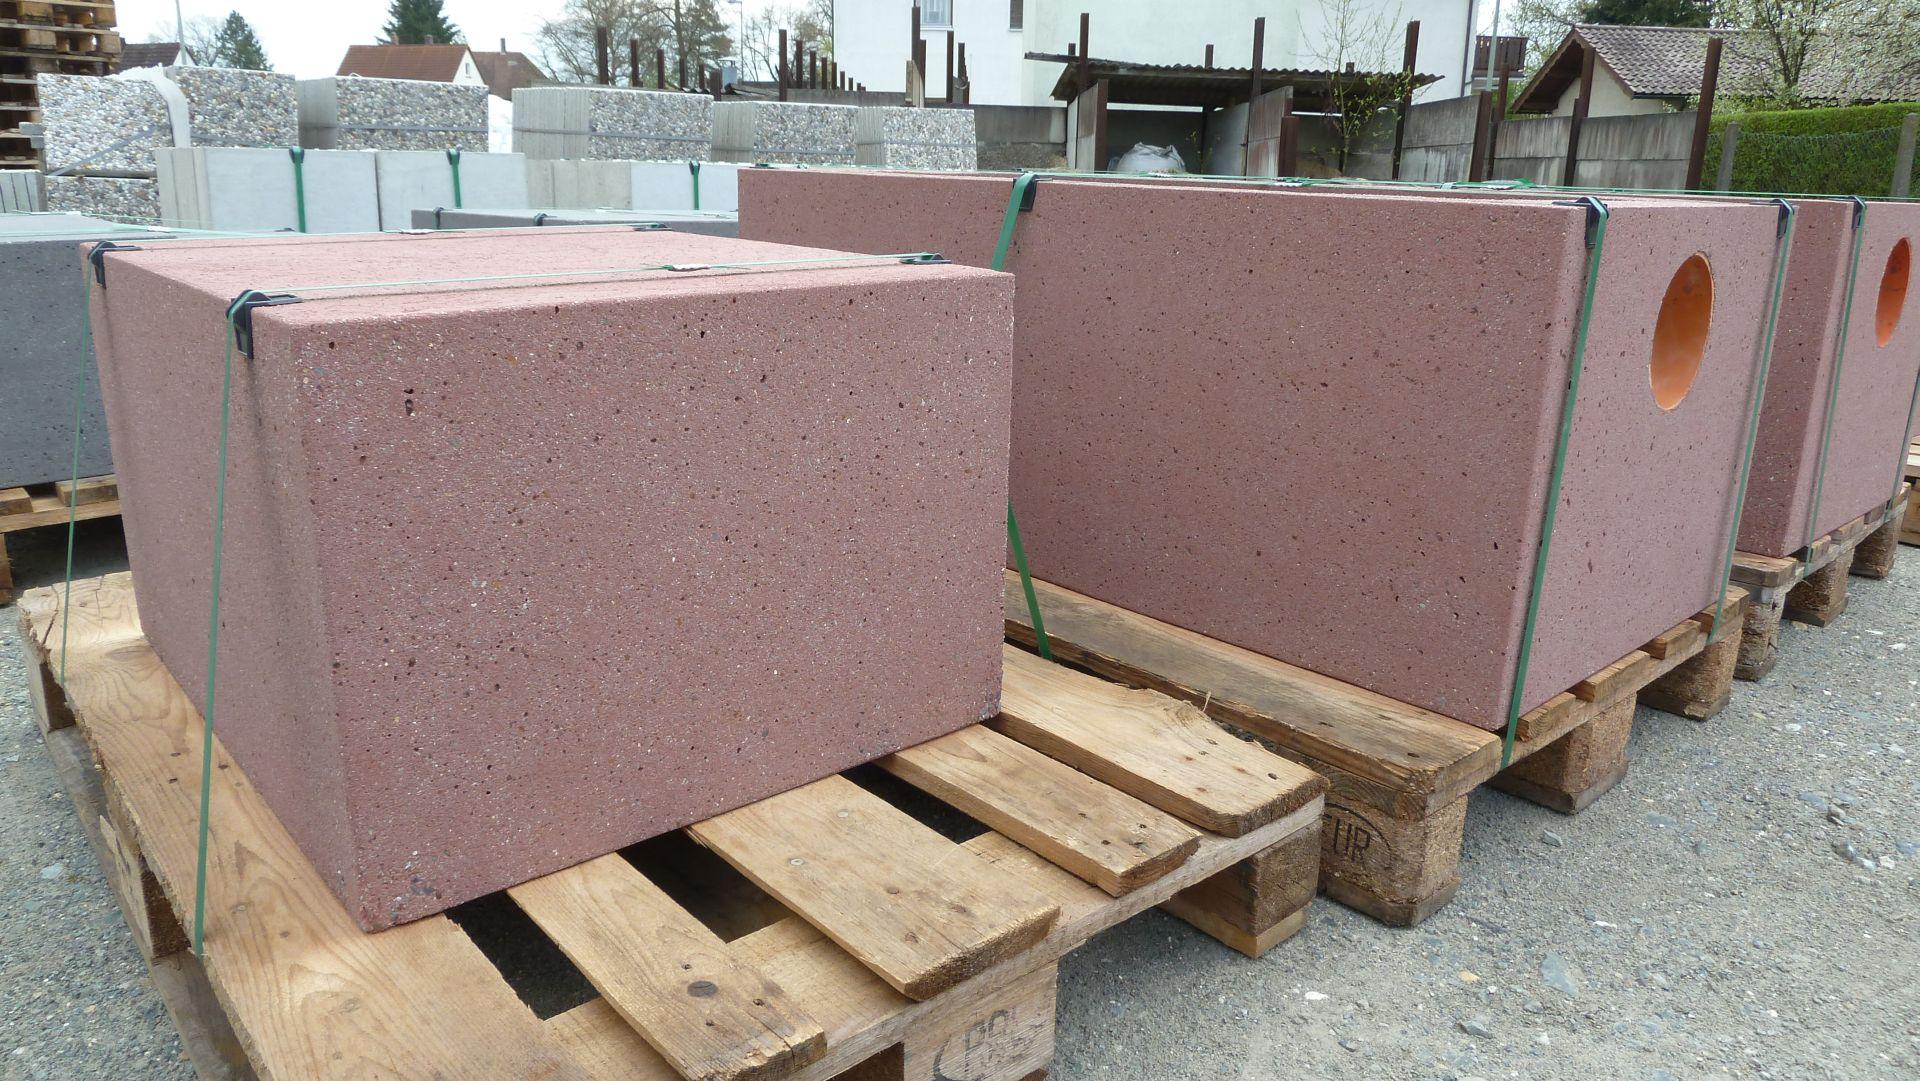 informationen rund um den baustoff beton wagner treppenbau mainleus. Black Bedroom Furniture Sets. Home Design Ideas